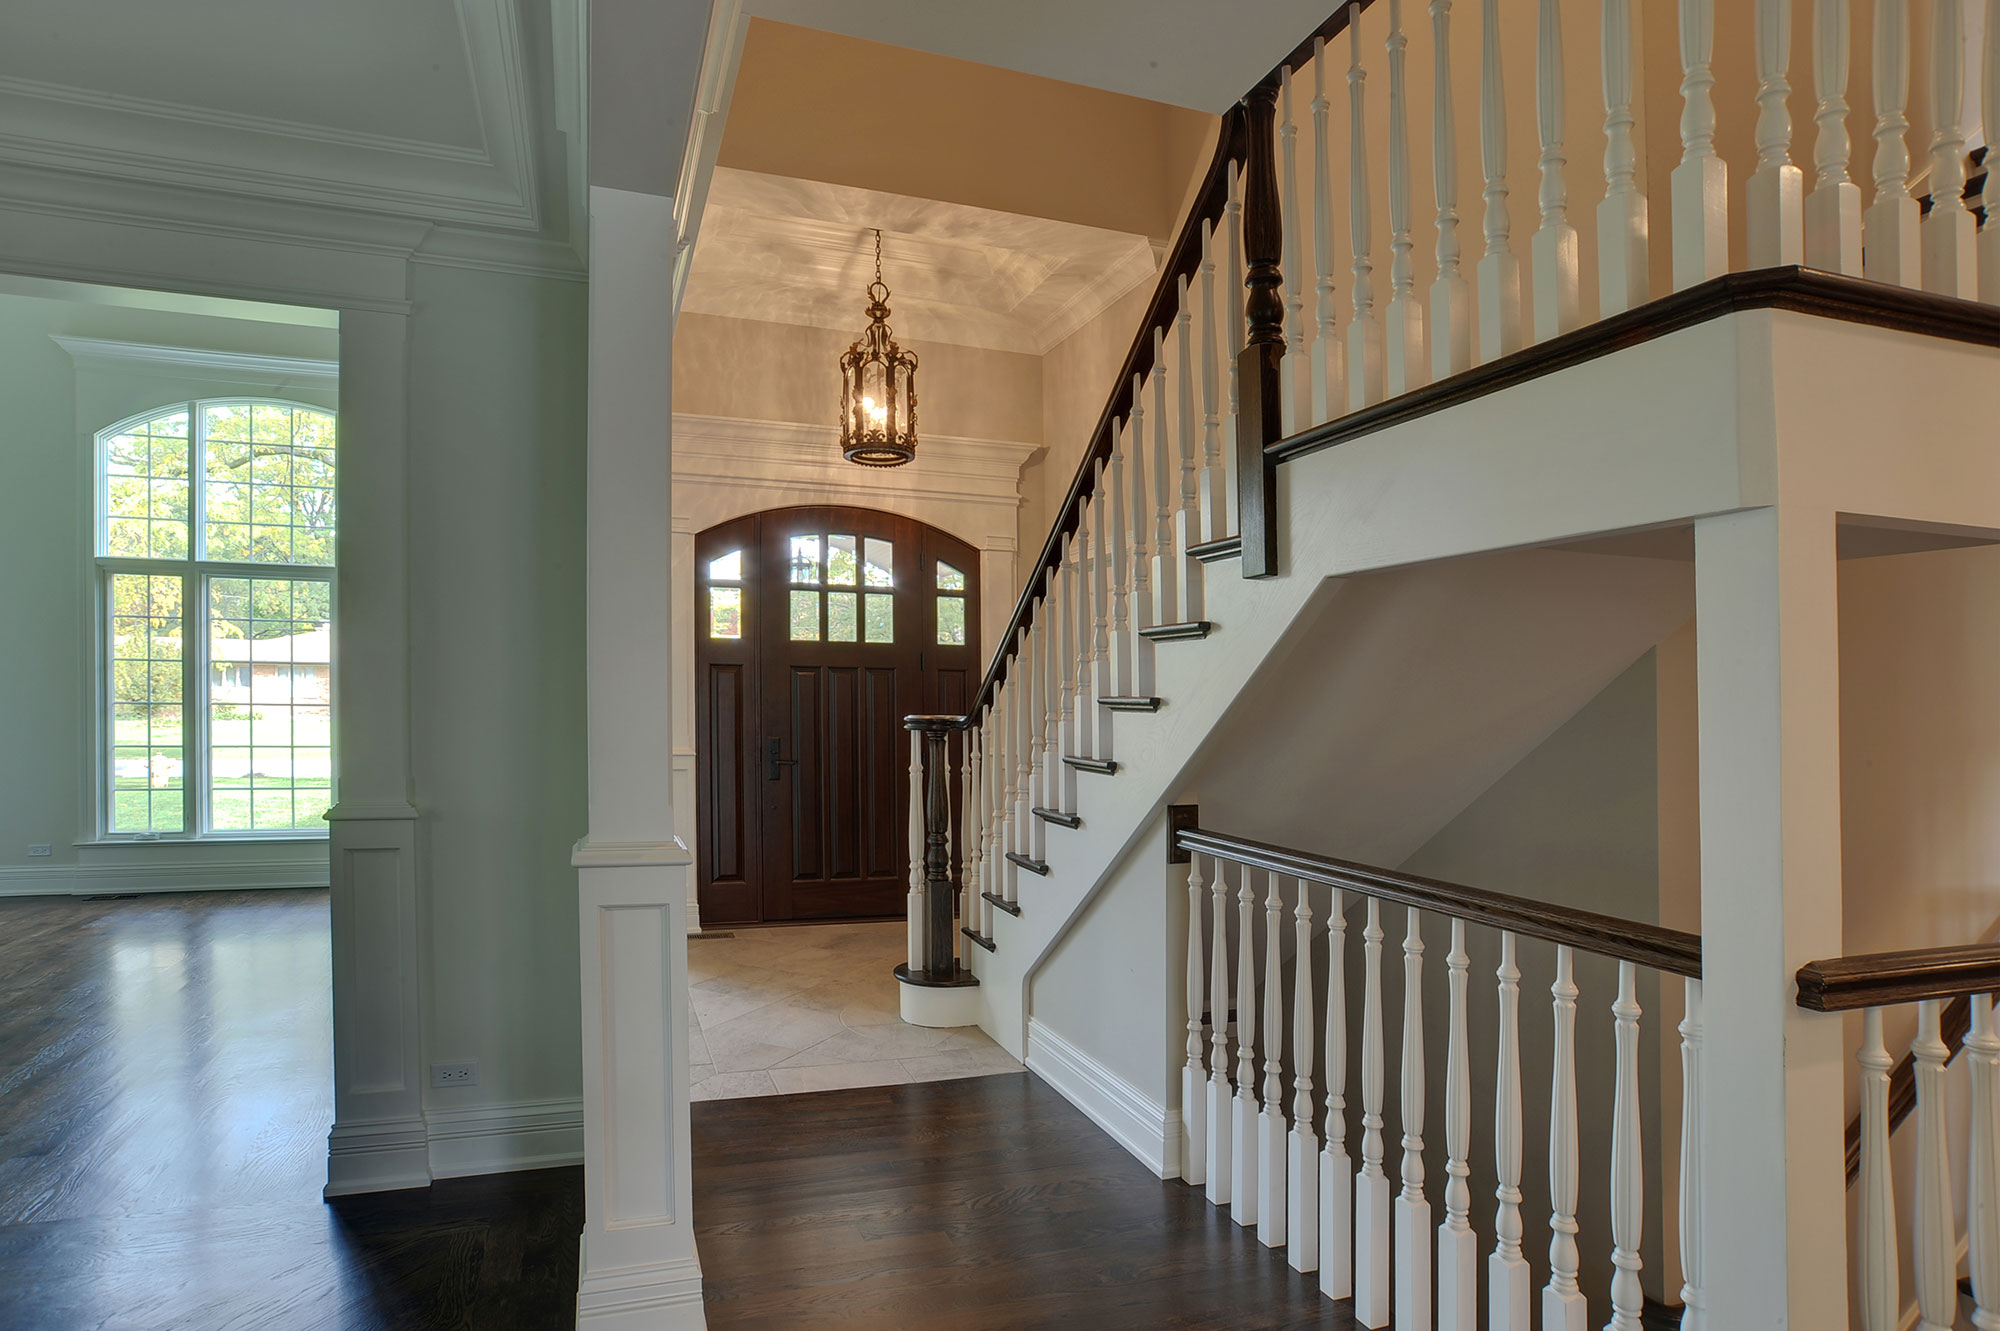 Lighting Basement Washroom Stairs: Globex Developments, Inc. - Custom Home